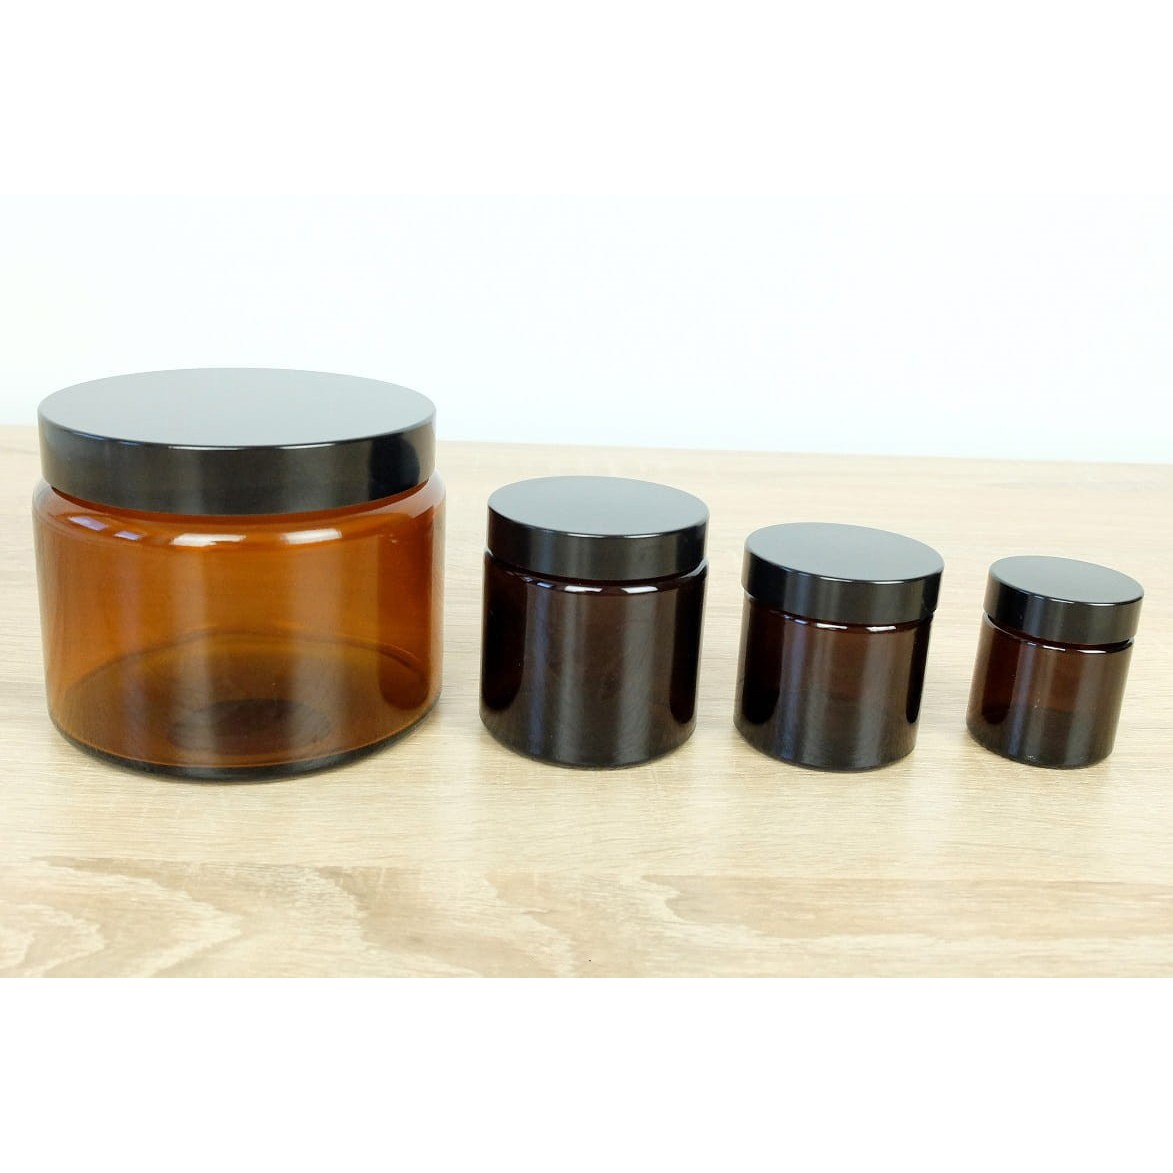 Sklenená nádoba hnedá 500 ml 84x86mm megamix.sk